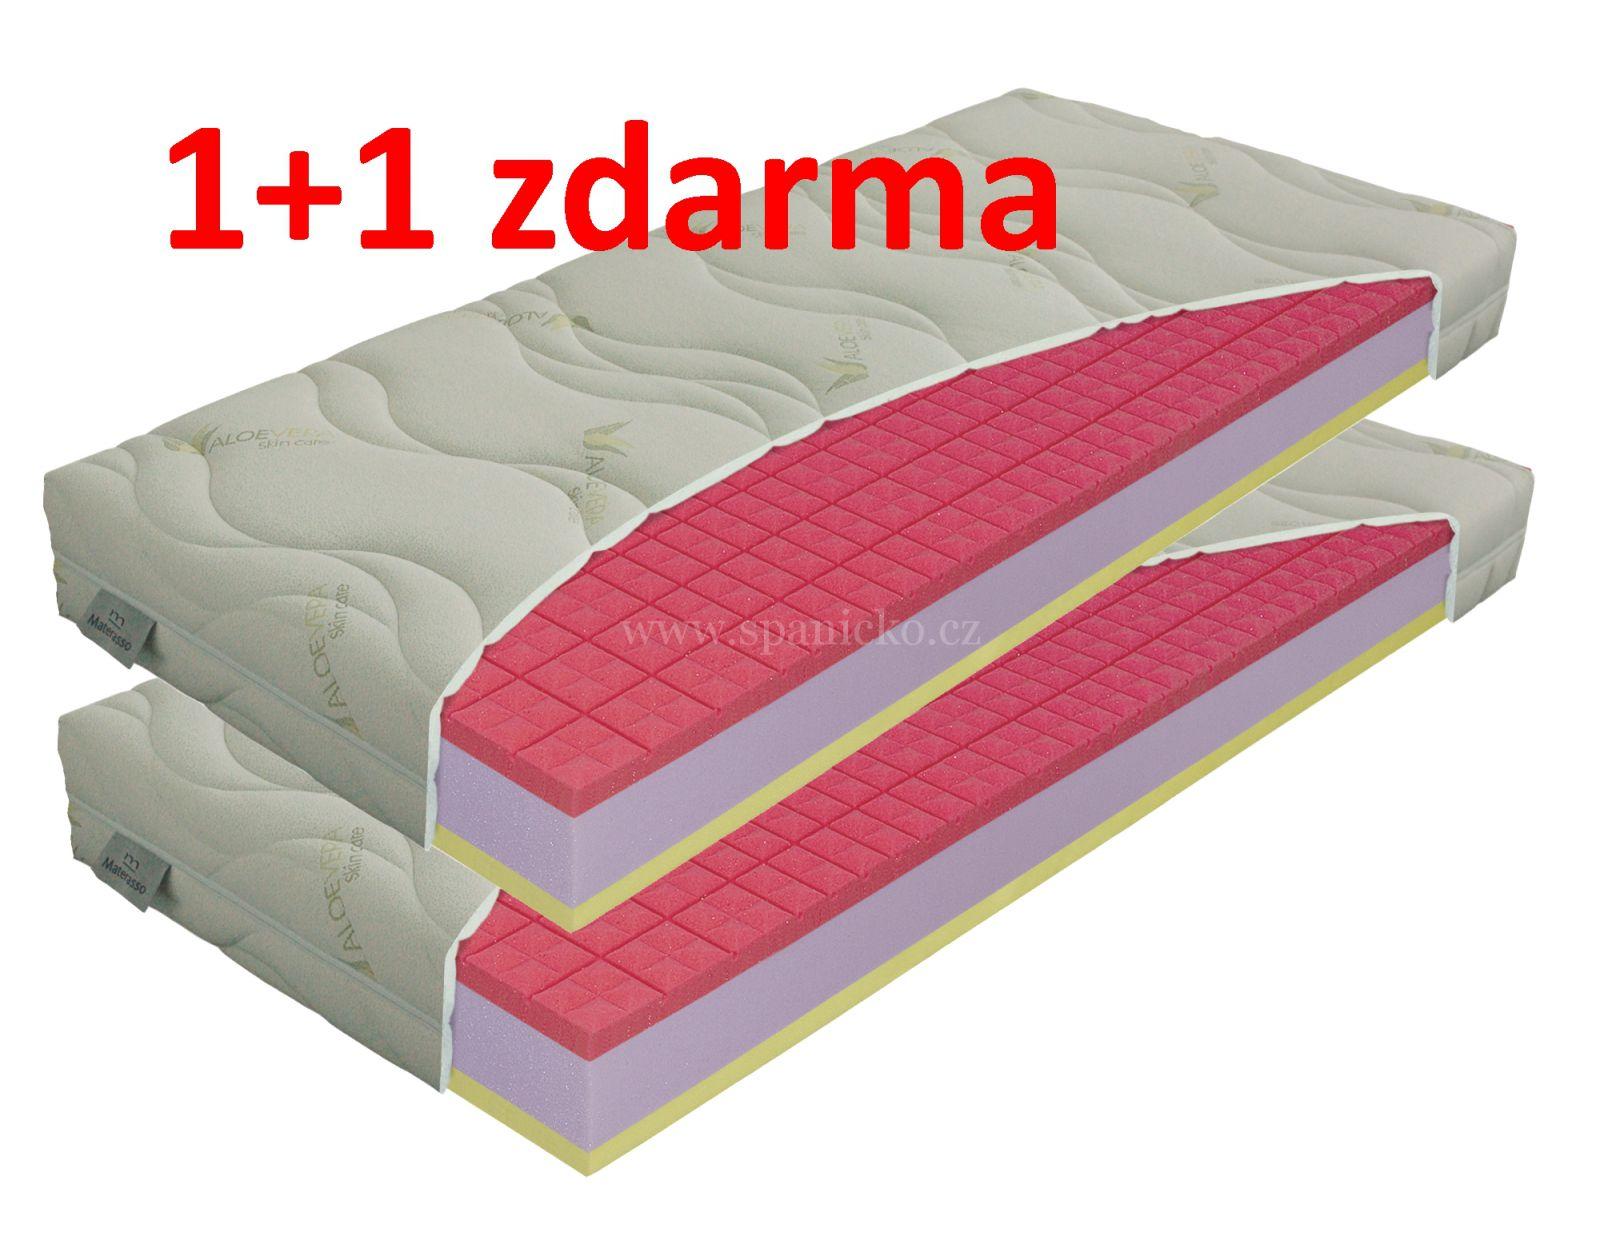 matrace ANTIBACTERIAL visco vakuo 24cm / 1+1 zdarma /+dárek MATERASSO